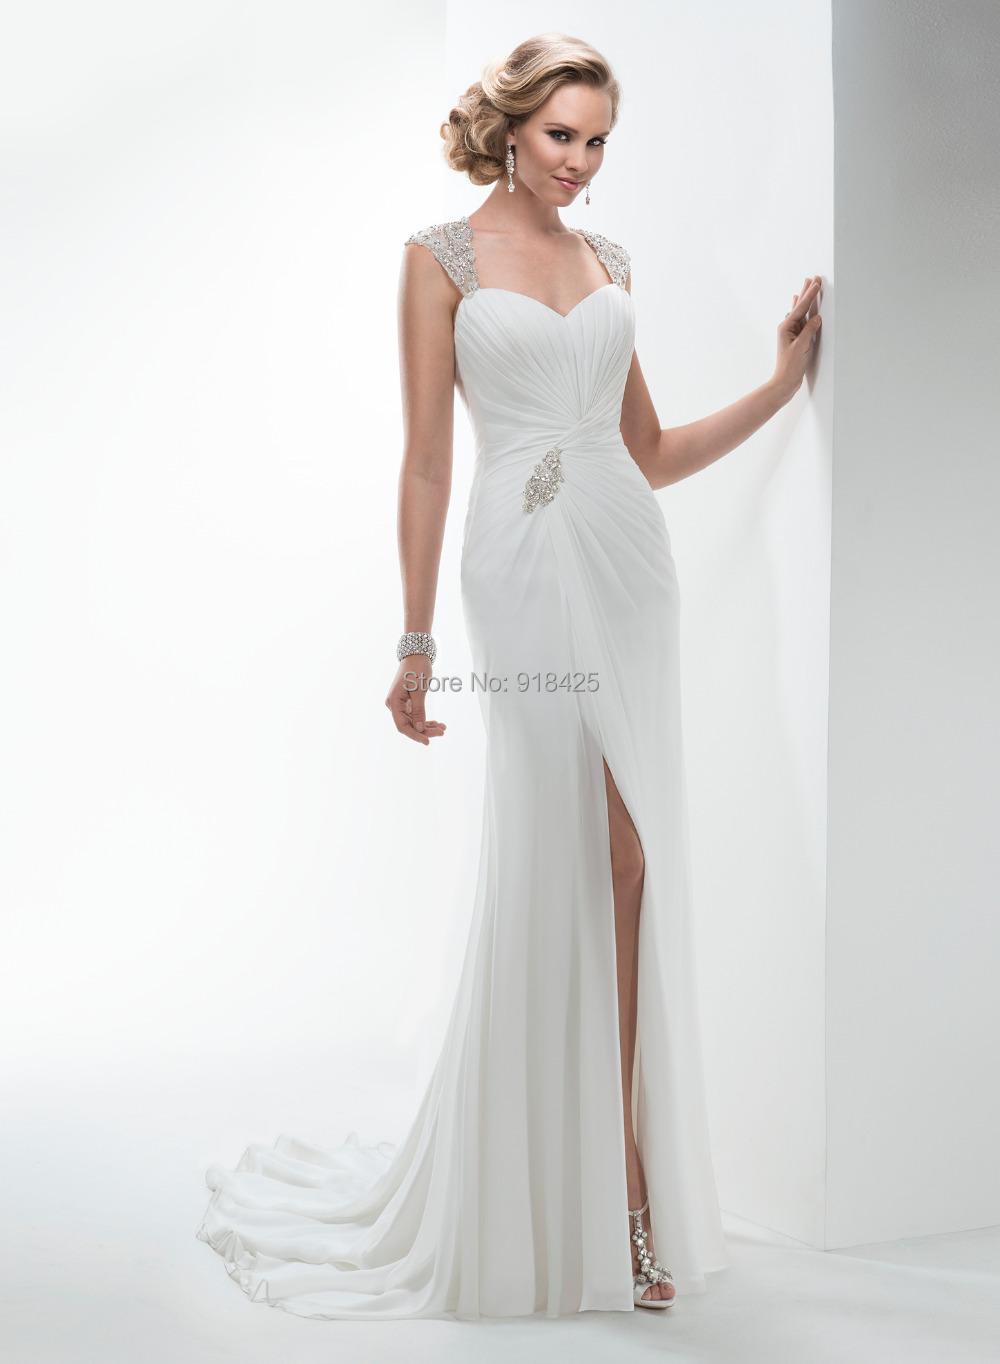 Buy new style beaded chiffon casual beach for Buy back wedding dresses